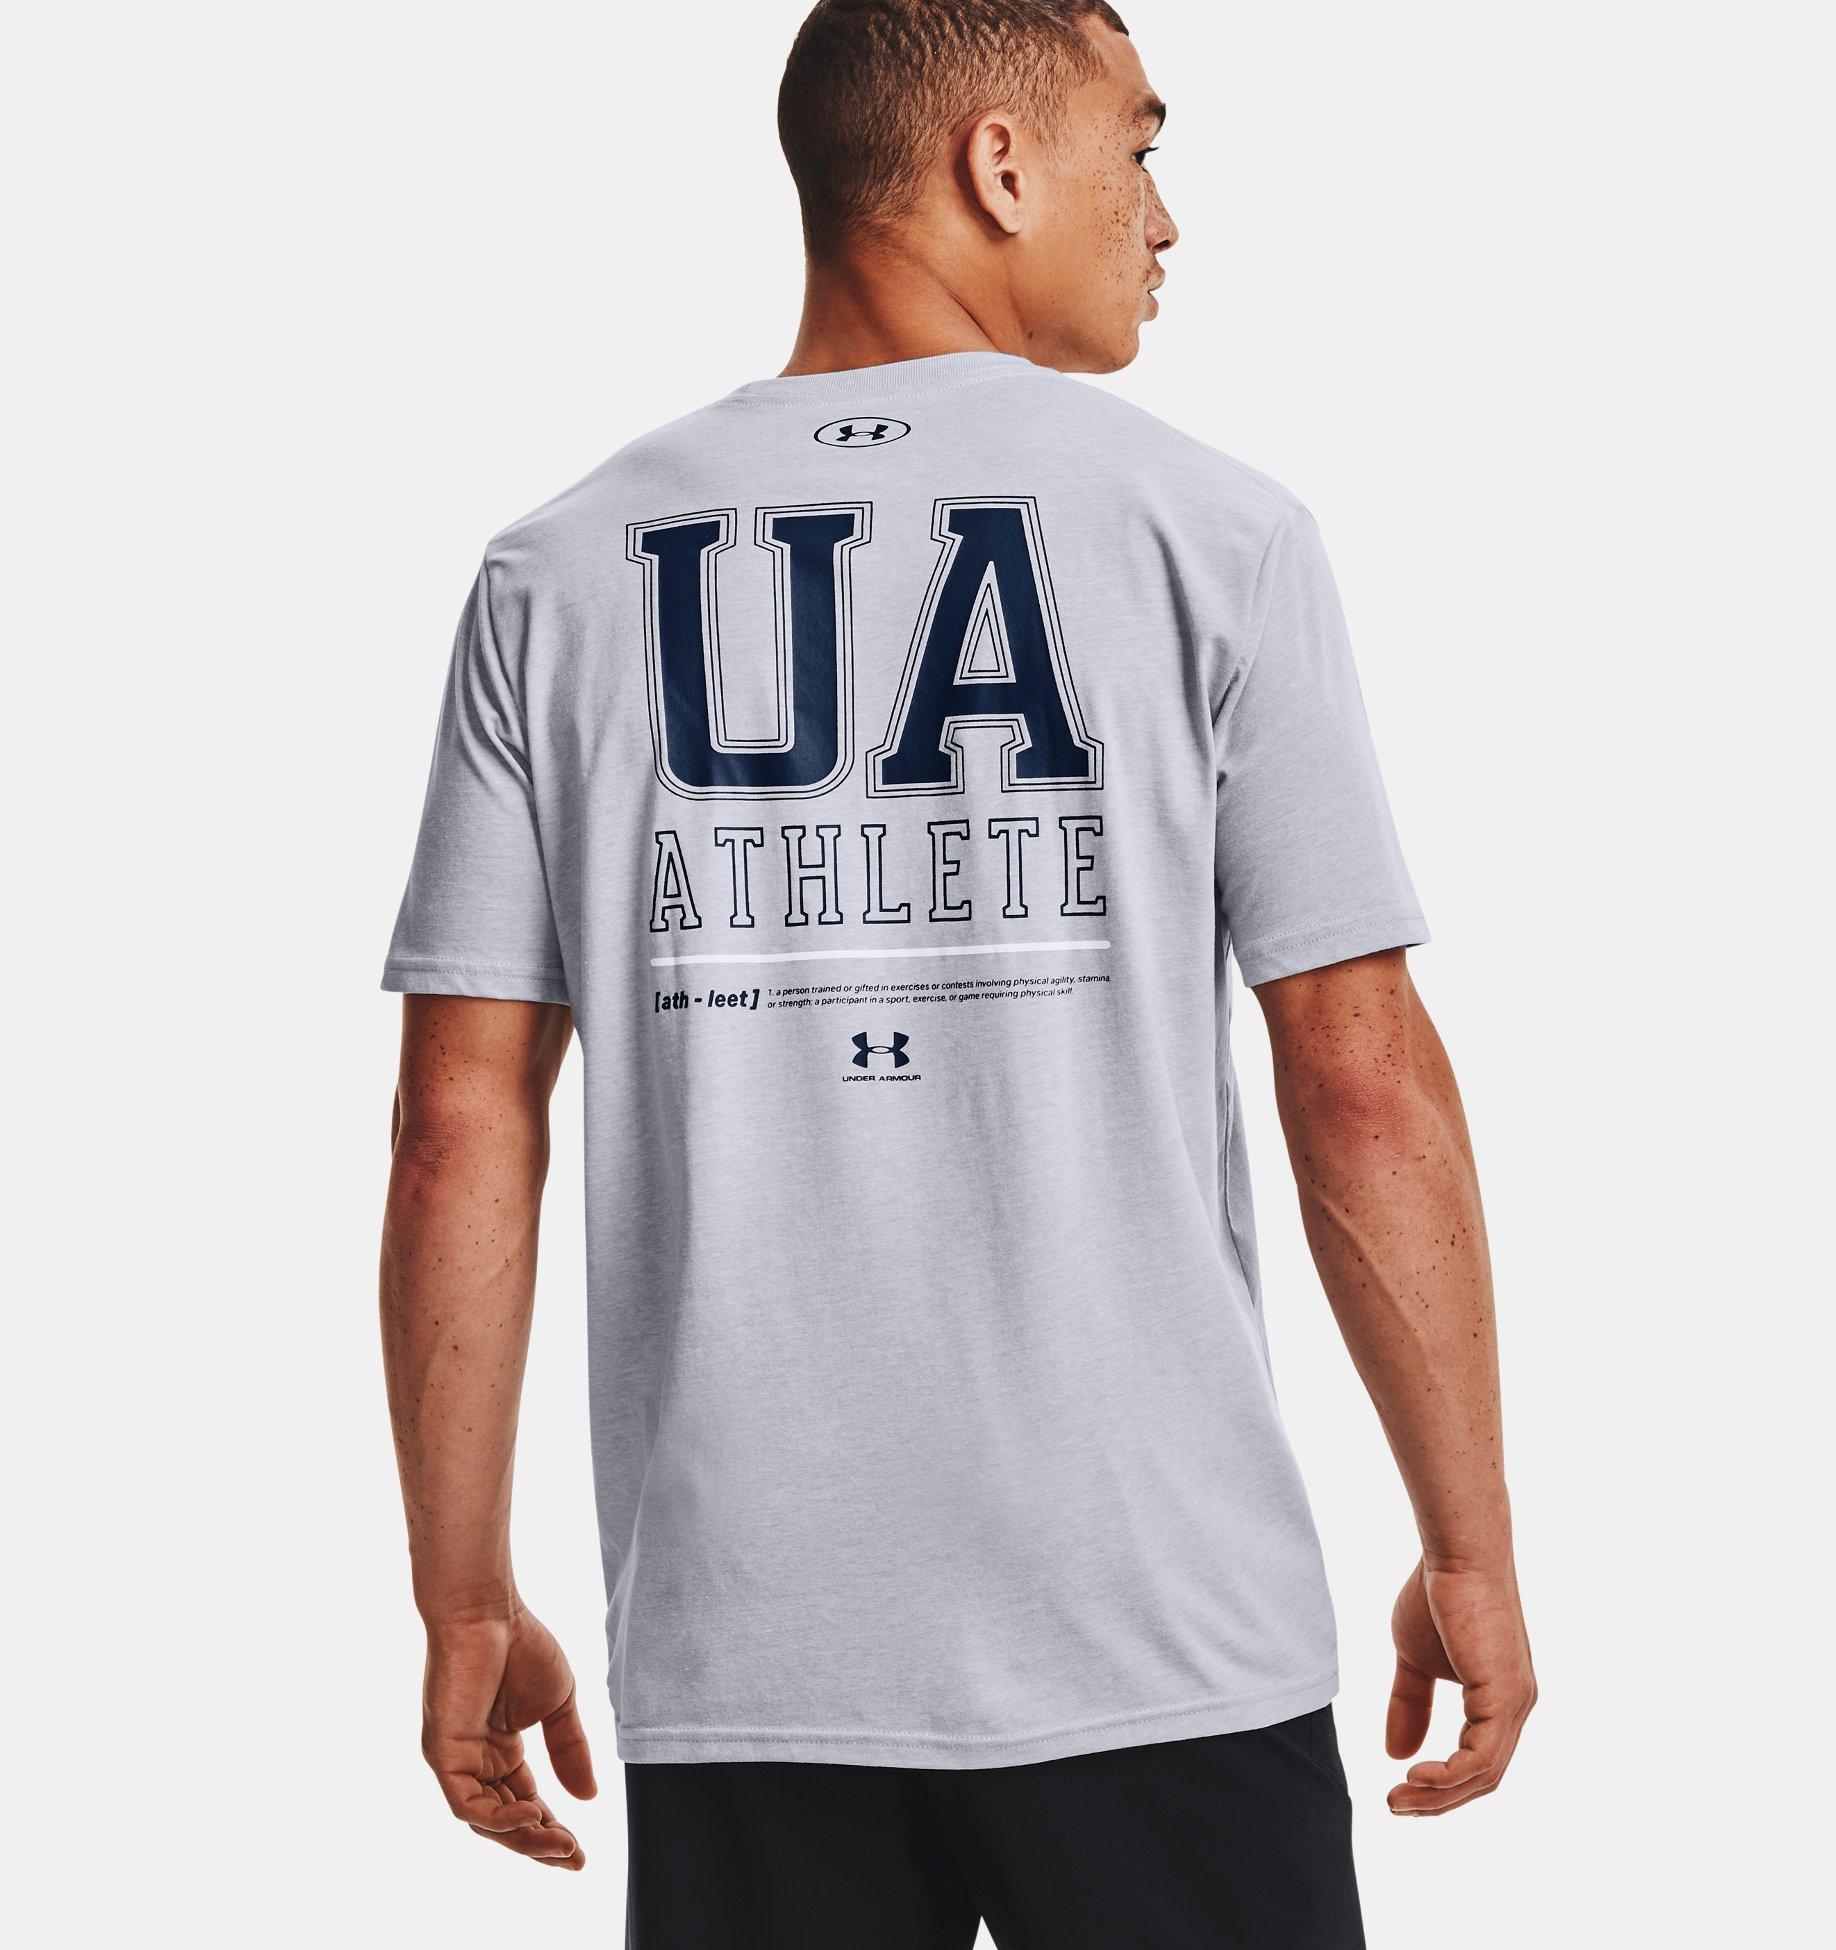 Underarmour Mens UA Vertical Left Chest Short Sleeve